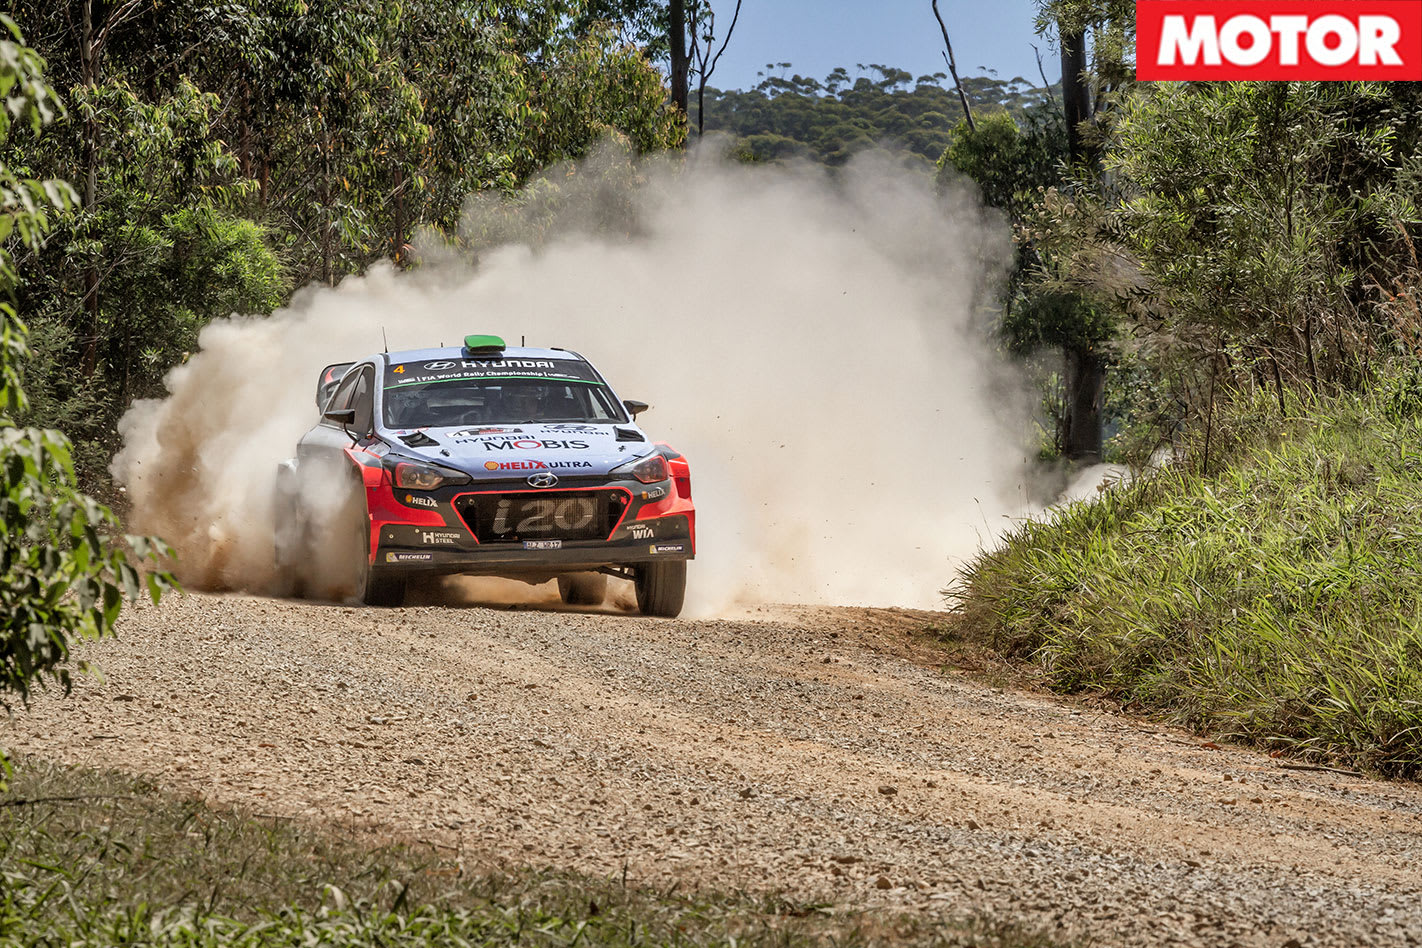 Hyundai i20 WRC Passenger Ride cornering